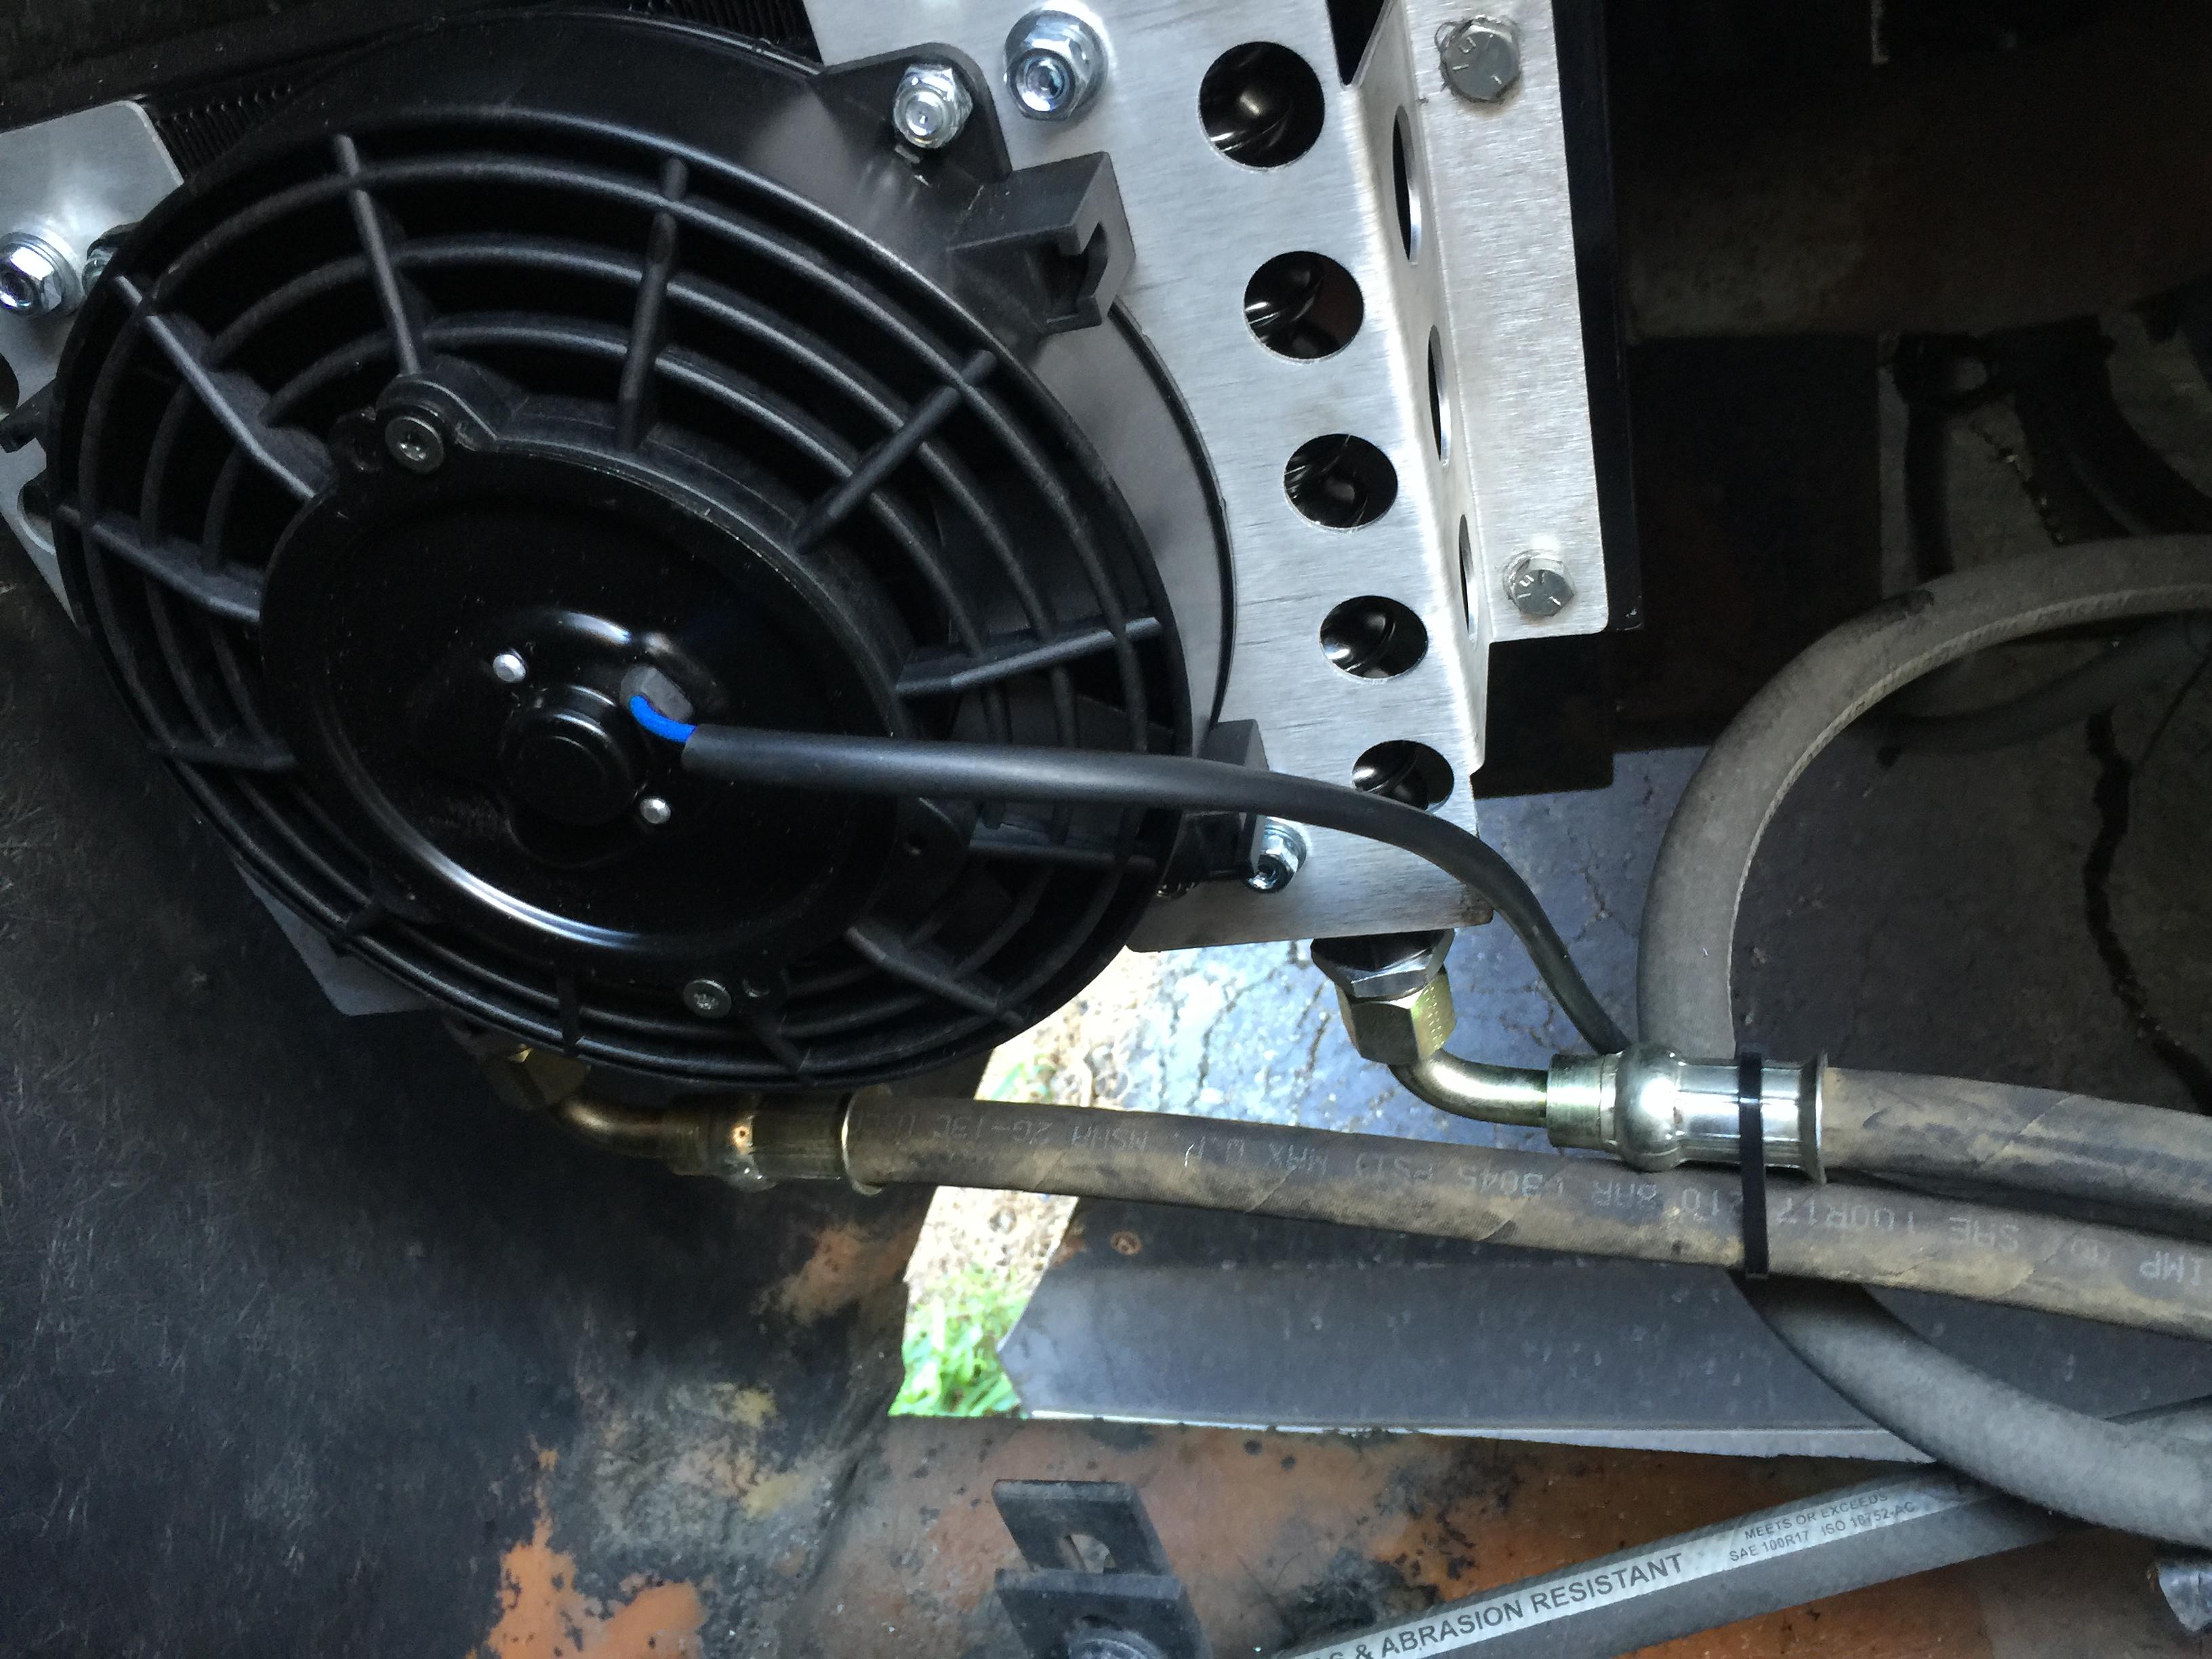 ISB Cummins Fuel Injection Pump Failure - Engines - FMCA RV